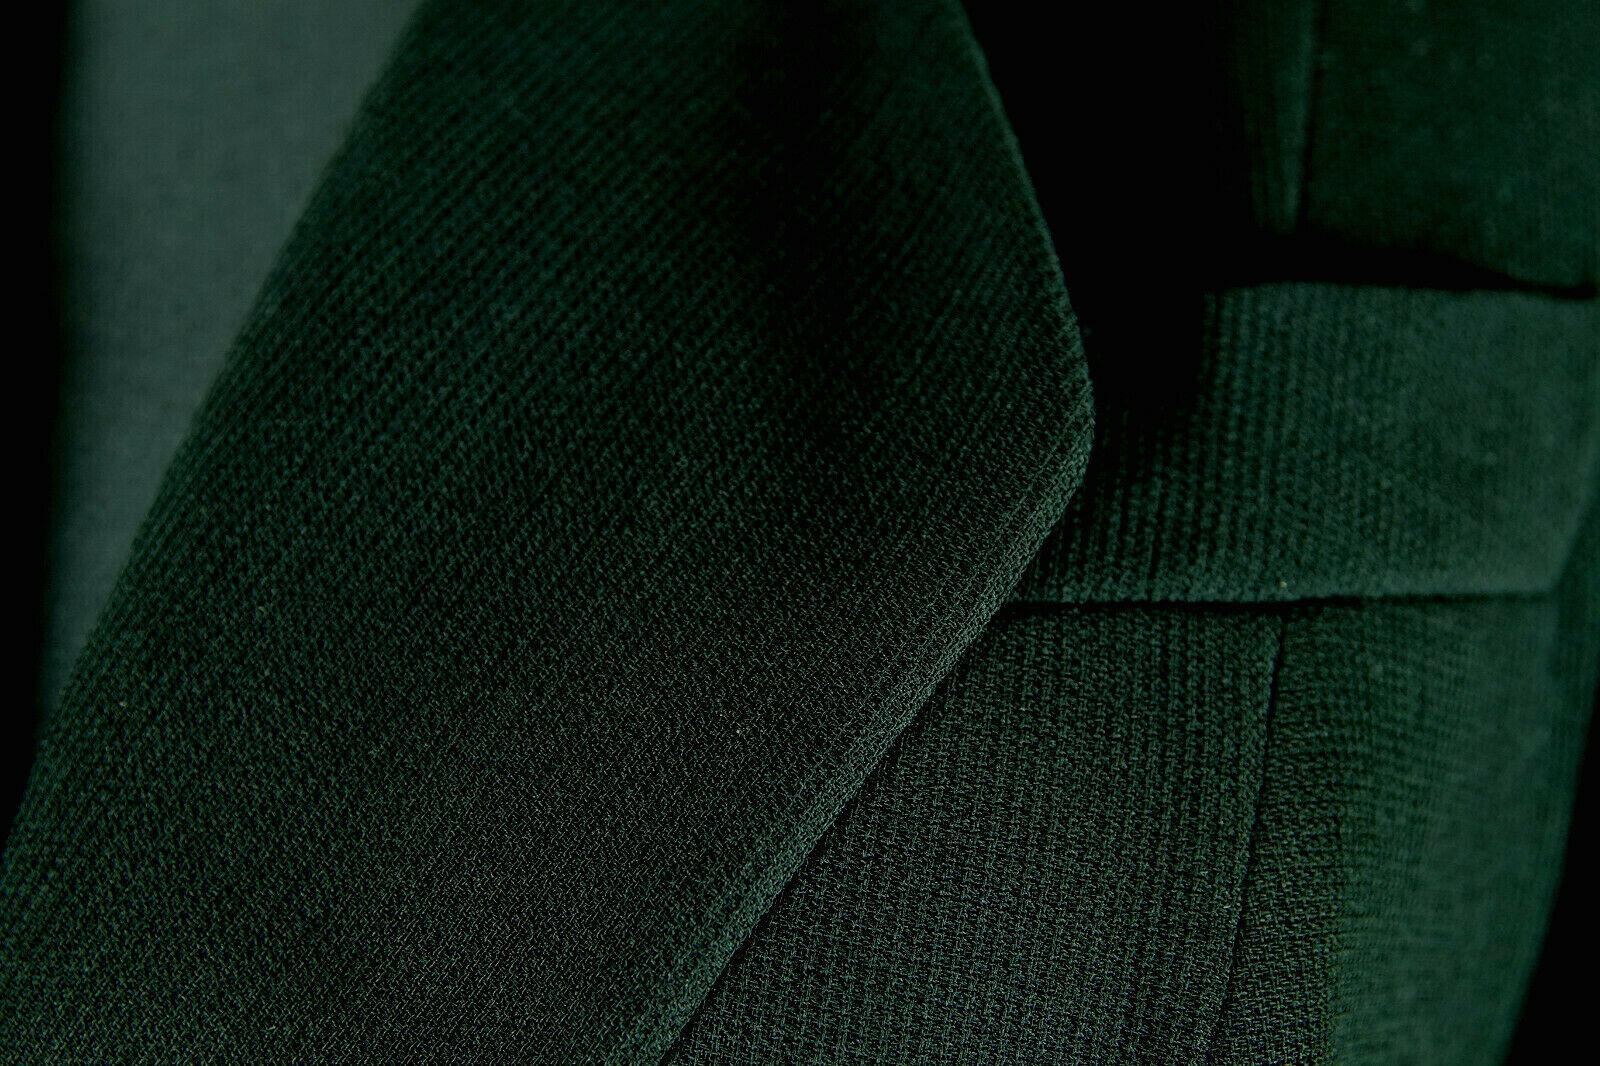 MANI Vtg Women's Double-Breasted Black Ribbed Jacket S-M Armani Diffusion Blazer